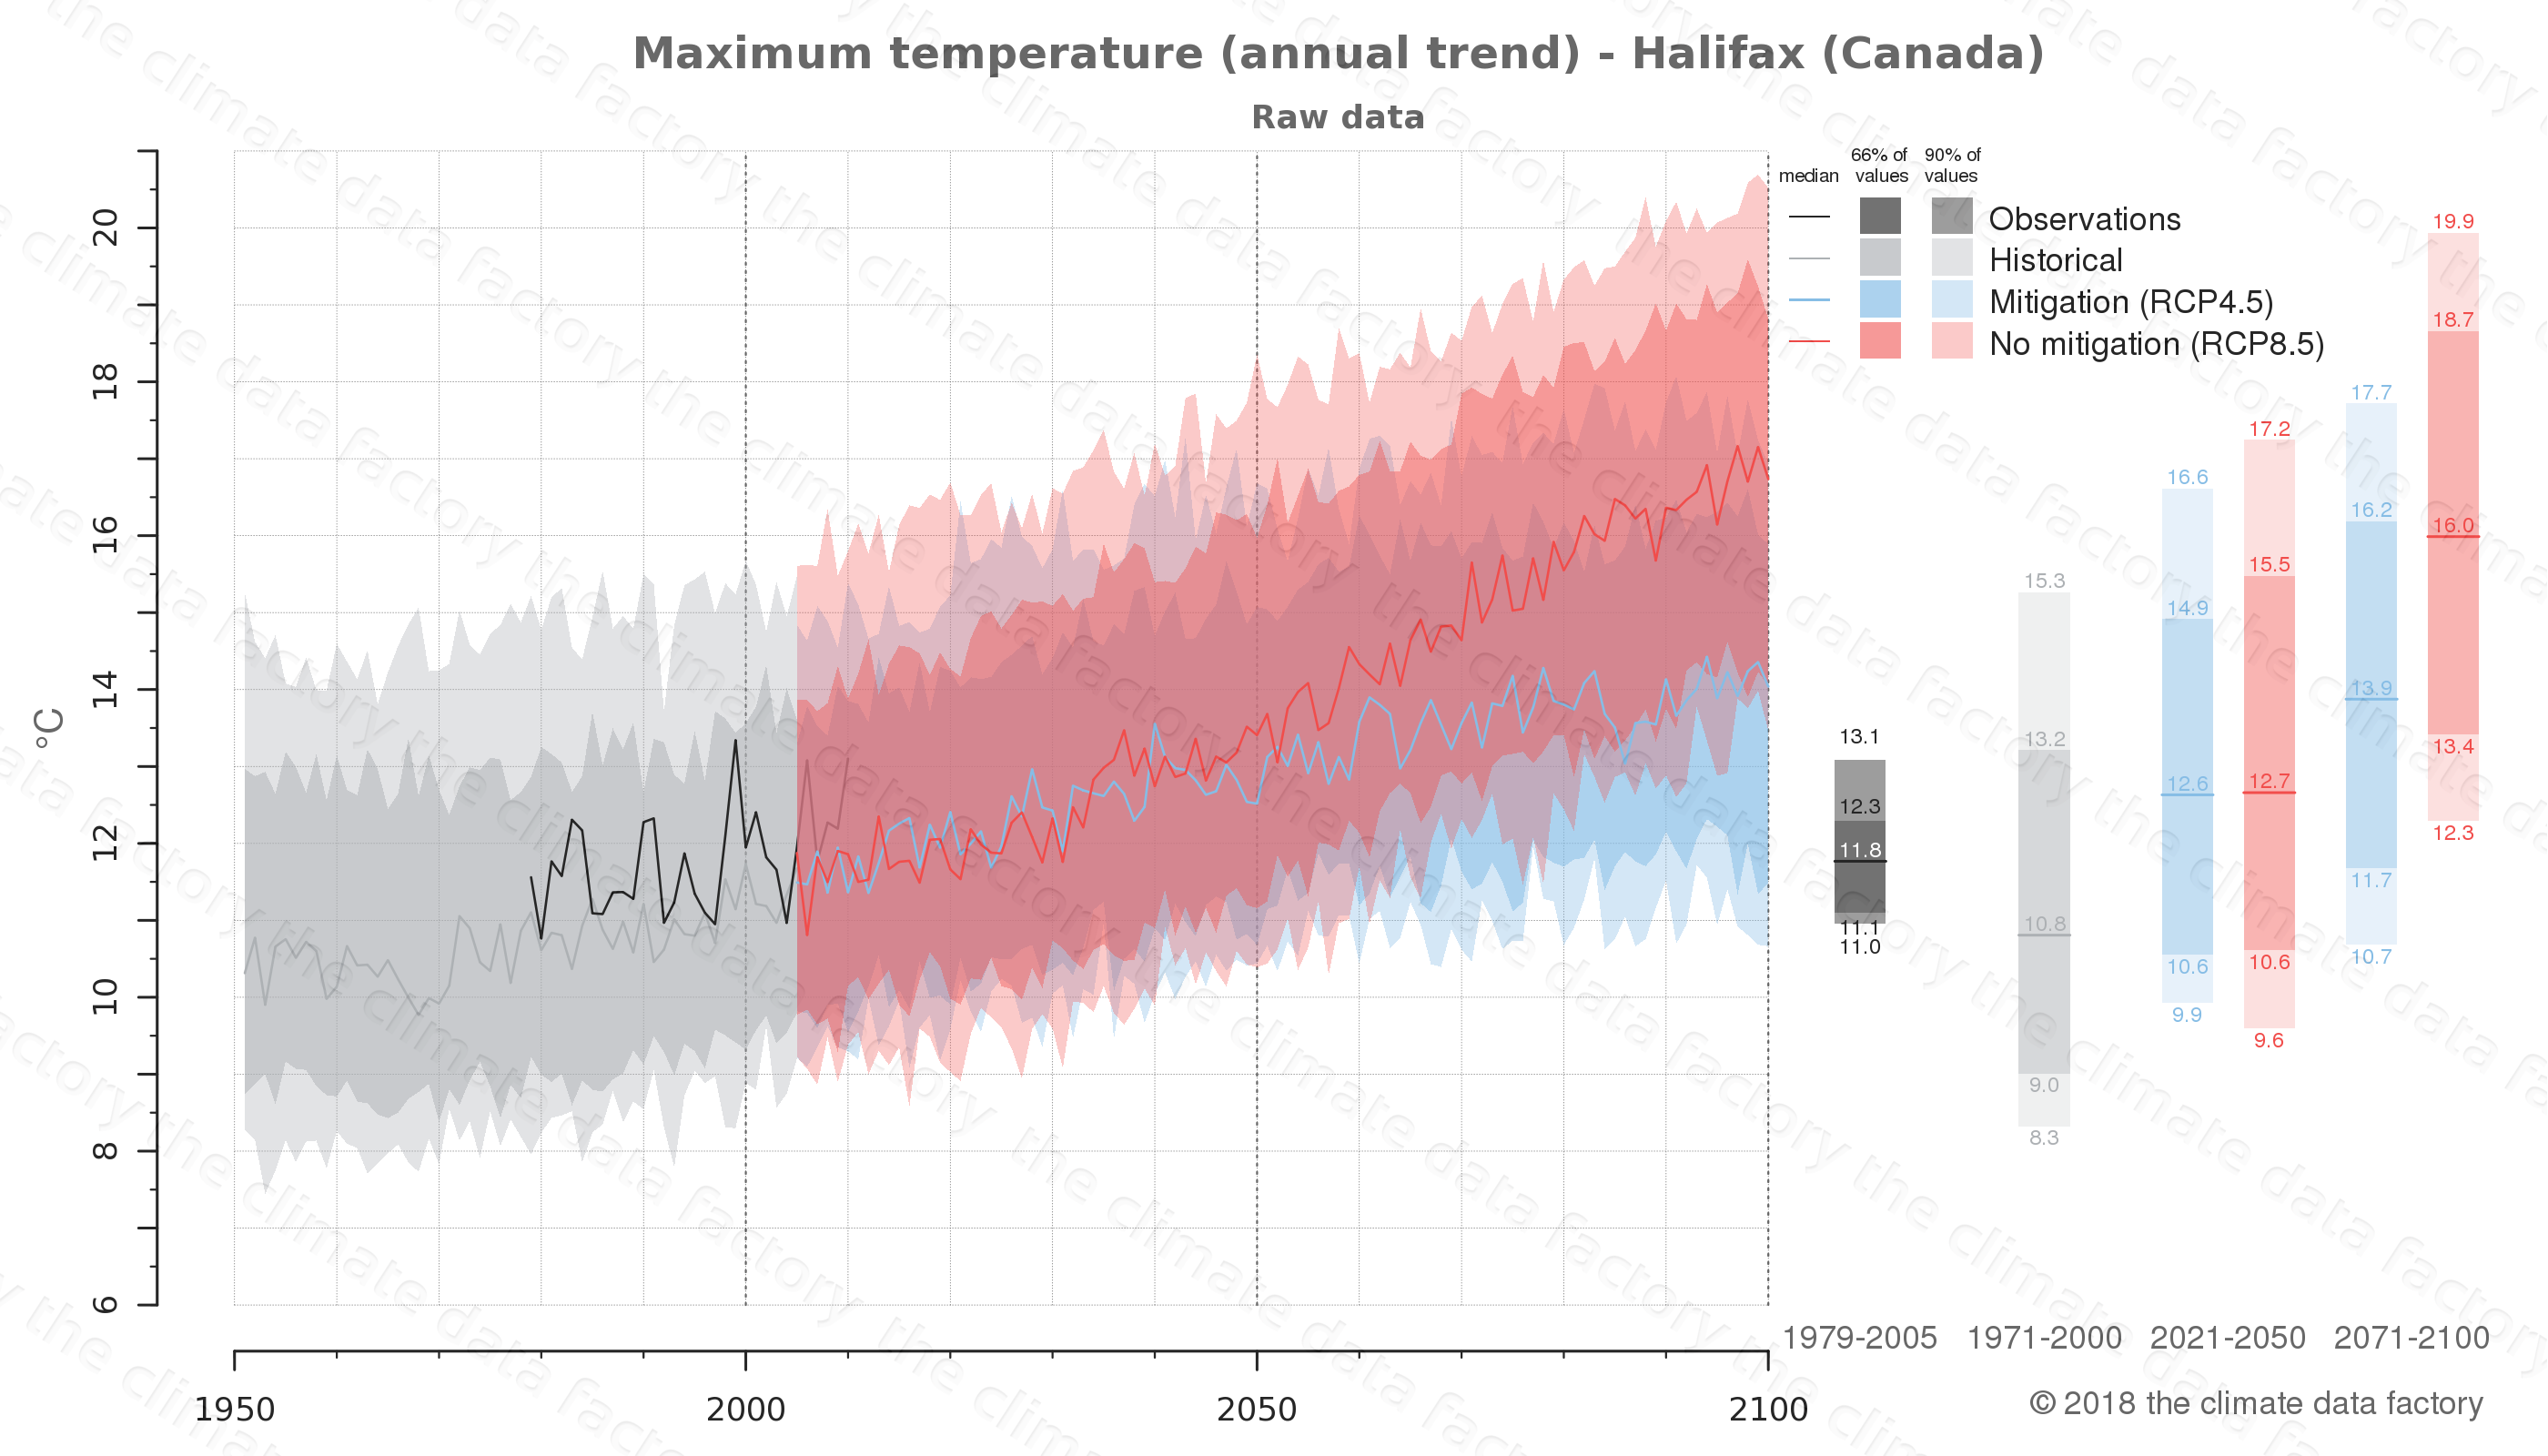 climate change data policy adaptation climate graph city data maximum-temperature halifax canada